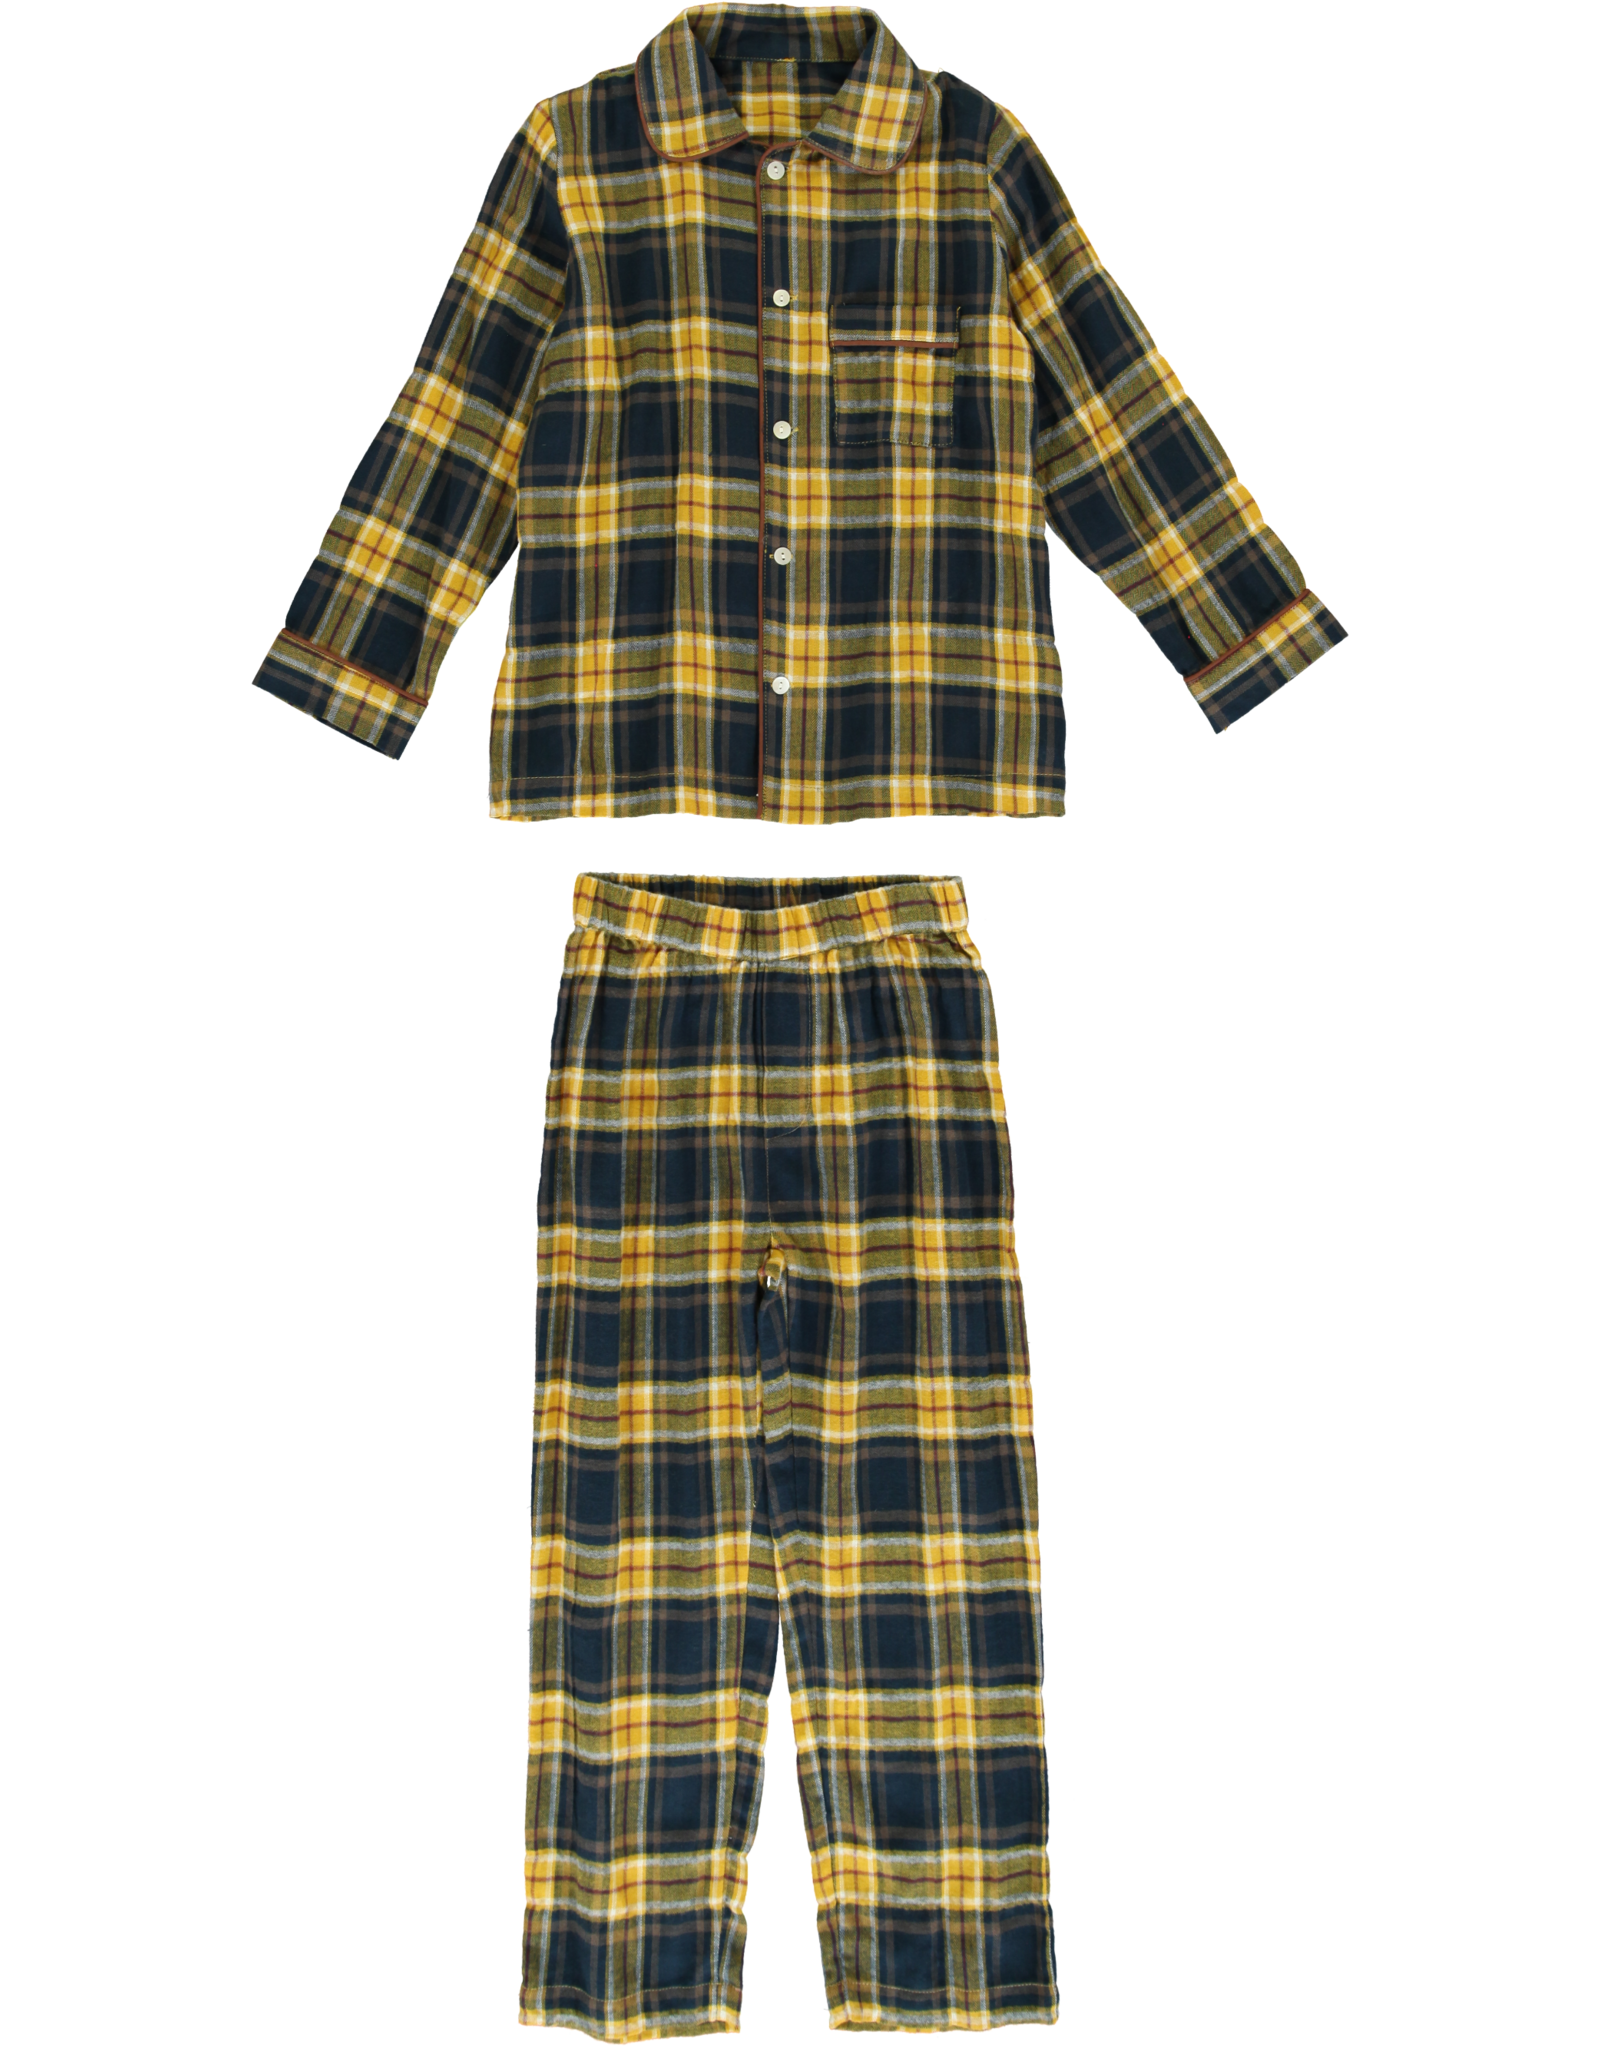 Dorélit Mercure + Venus | Pajama Set Woven | Check Navy